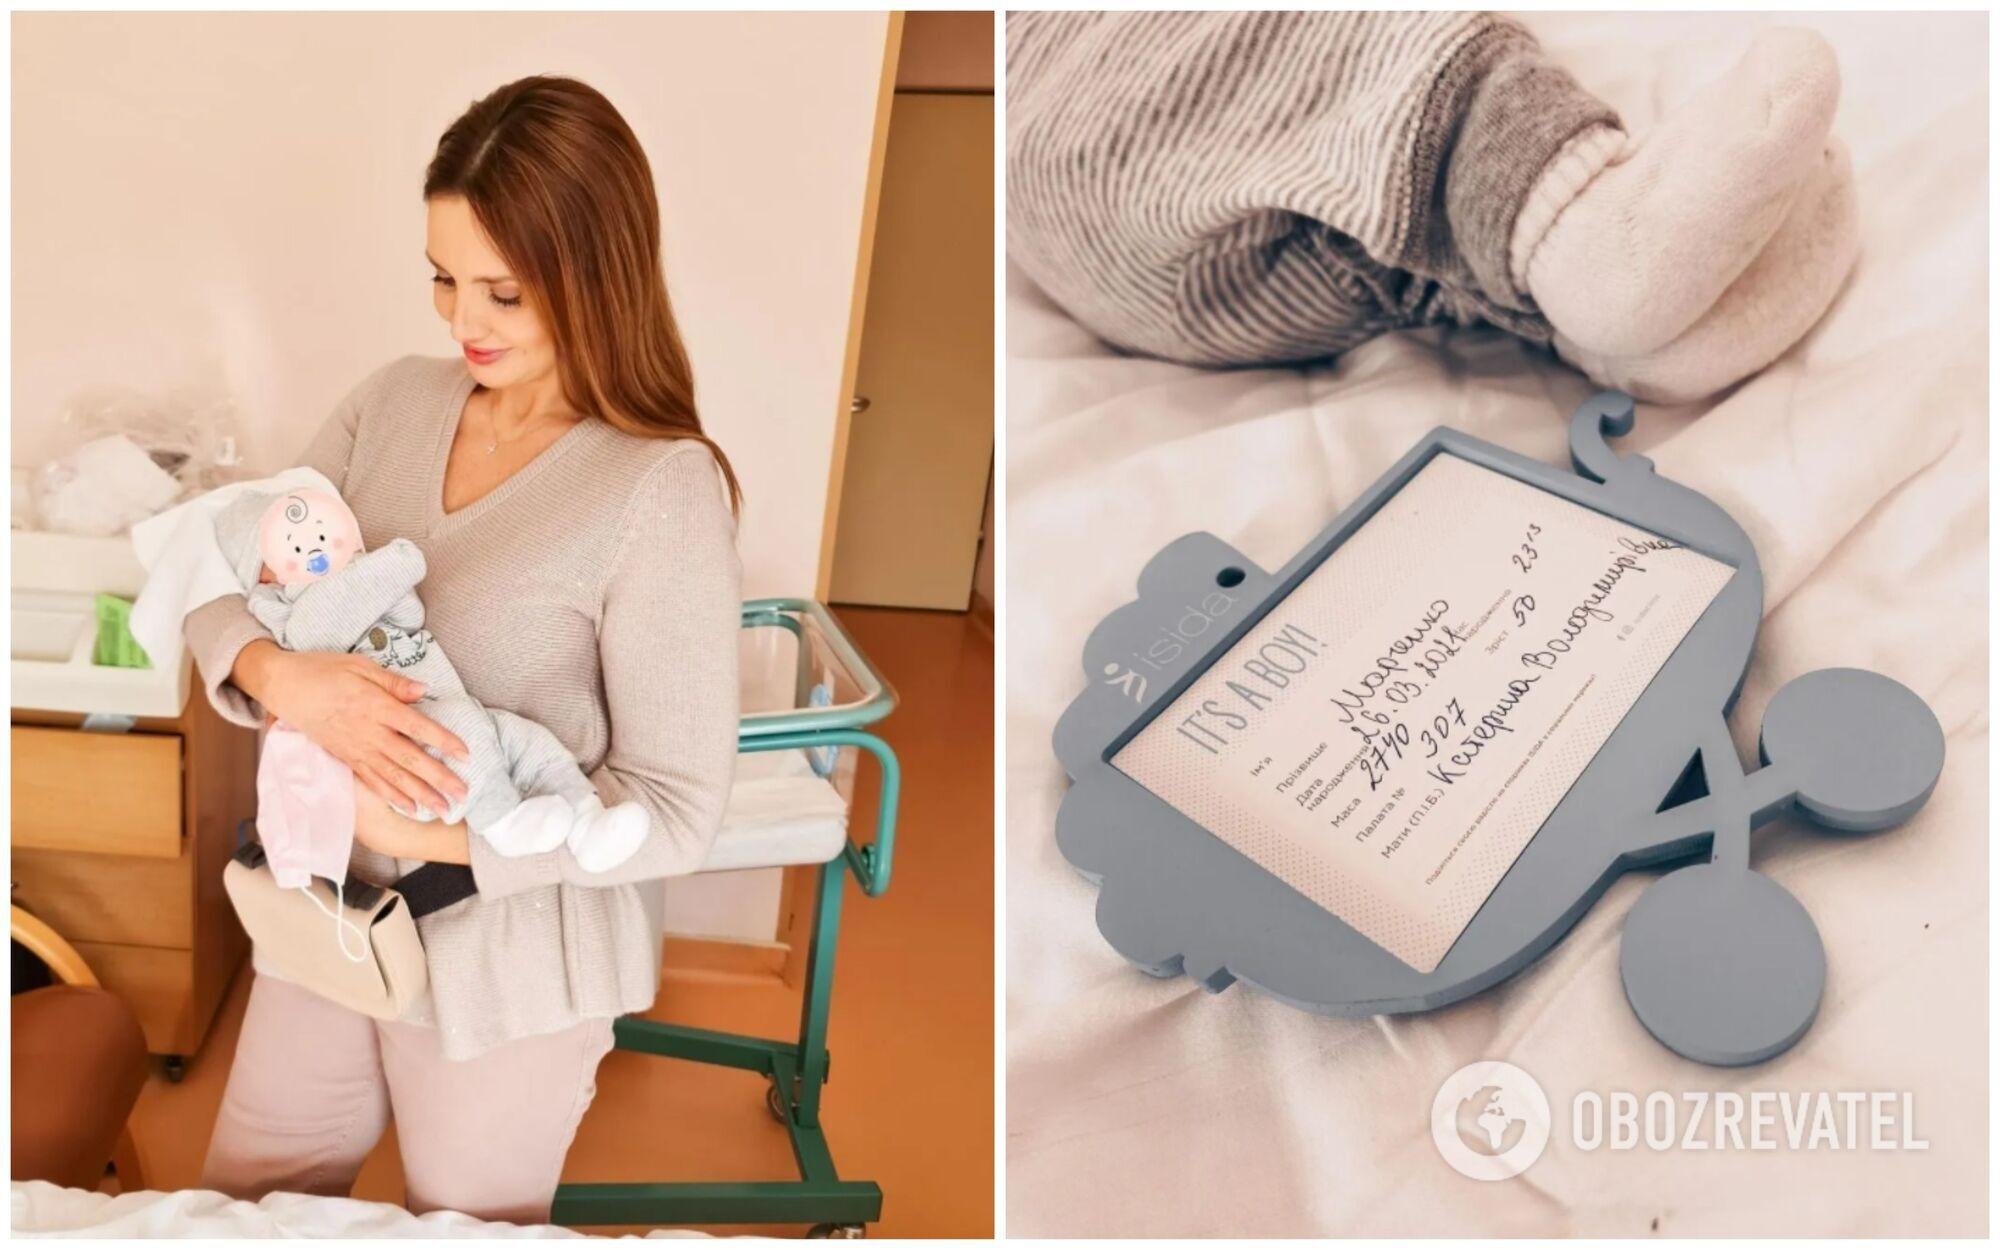 Українська телеведуча Оксана Марченко стала бабусею хлопчика Віктора